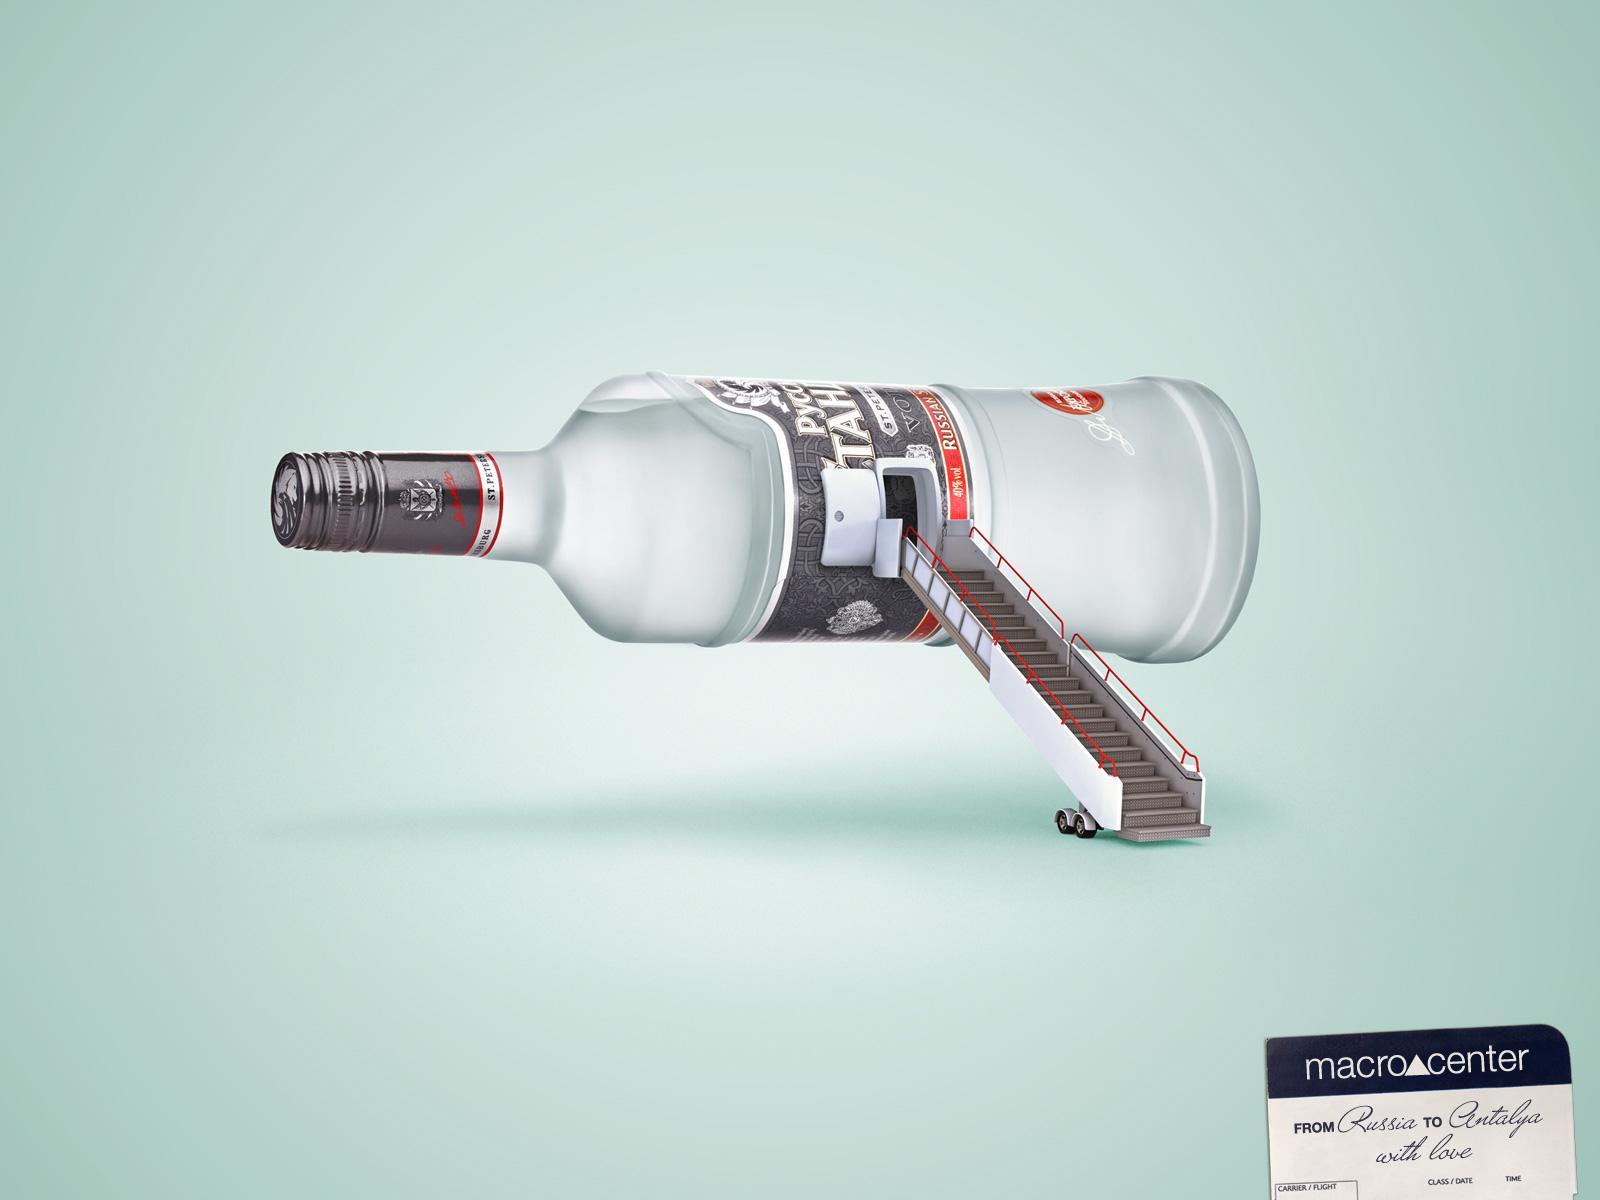 Macrocenter Print Ad -  Vodka